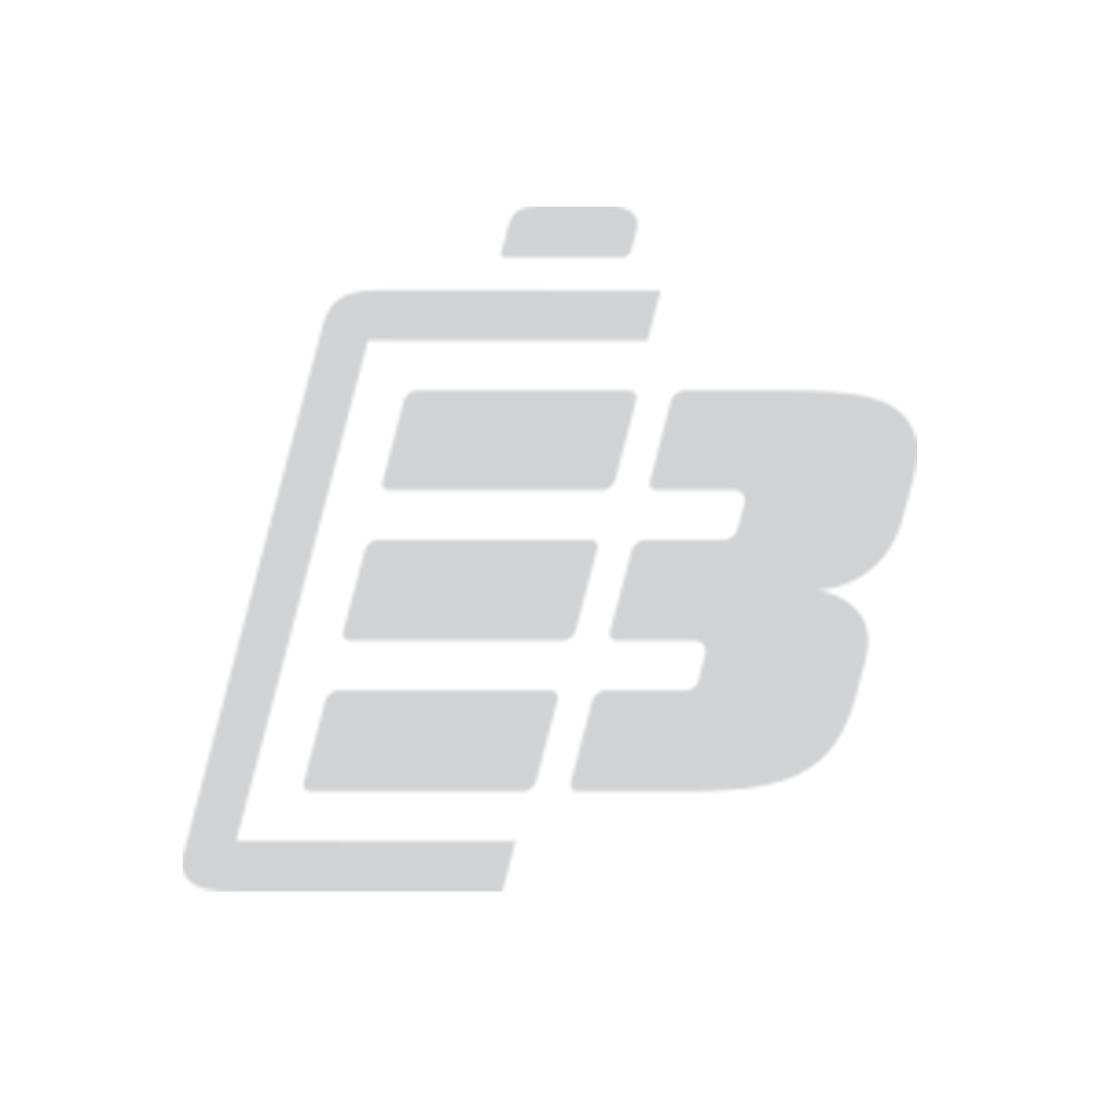 Two-Way radio battery Icom BP-196_1